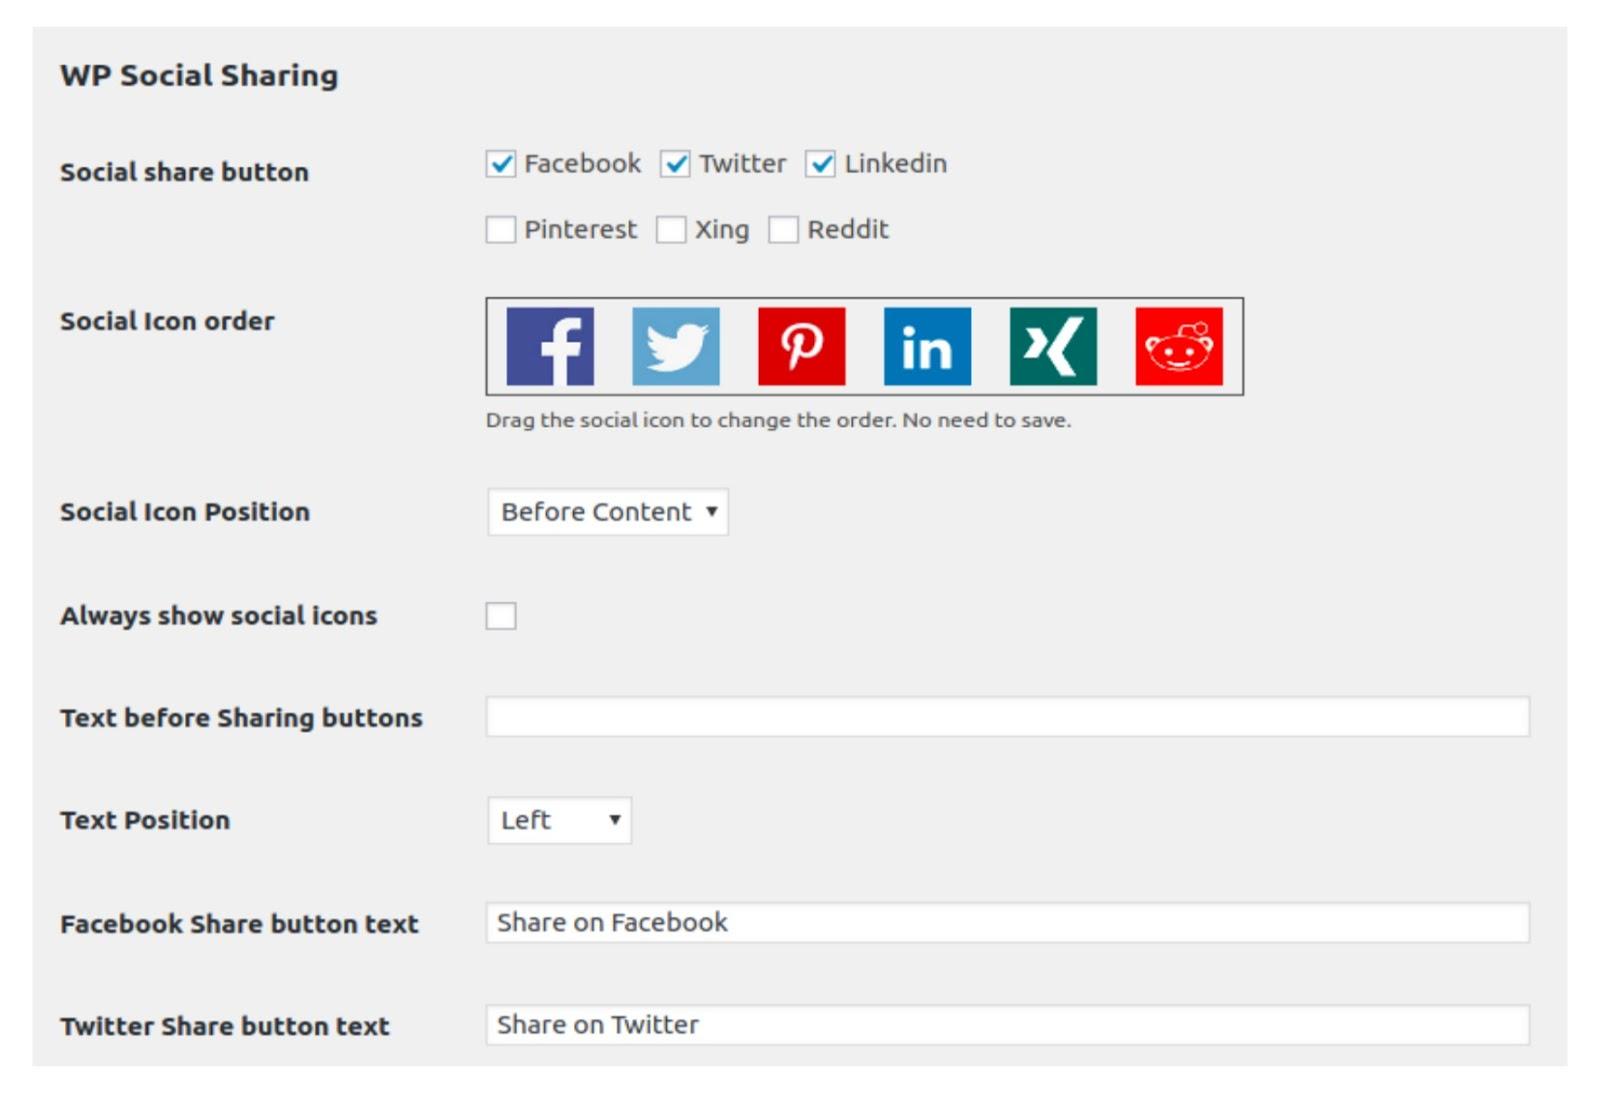 WP Social Sharing WordPress Plugin